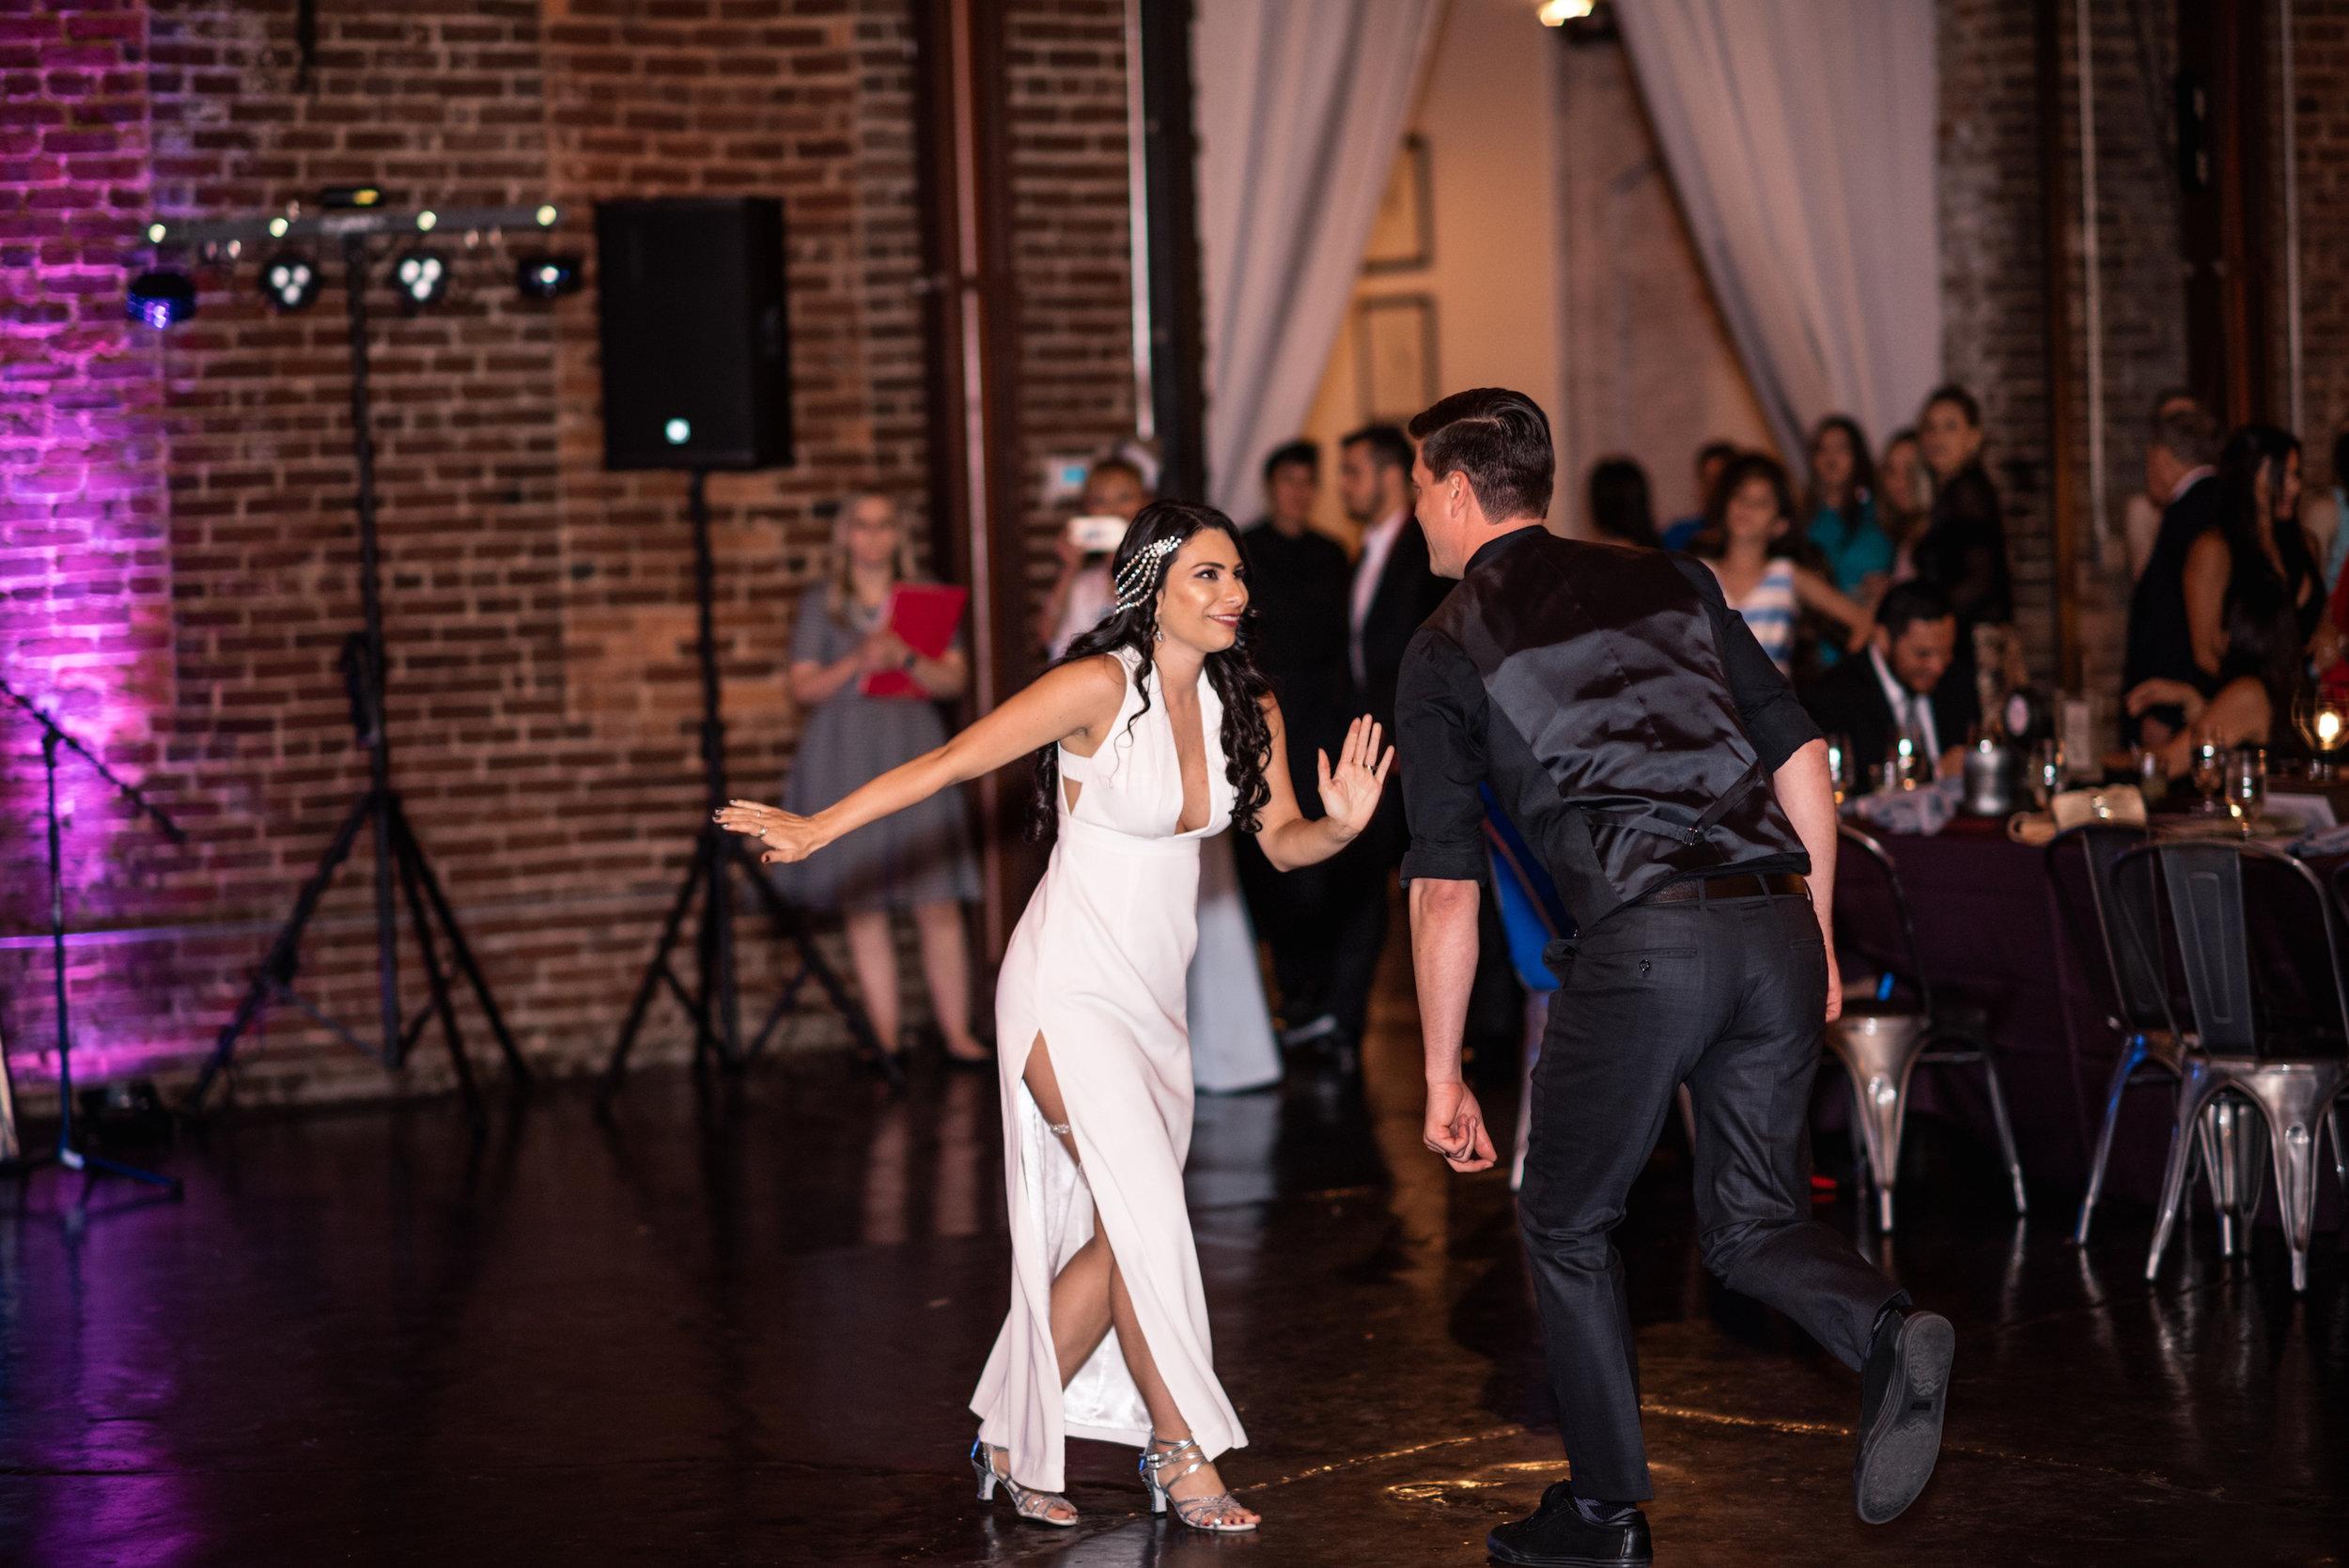 13-J&M Wedding April 1st 2017-80.jpg